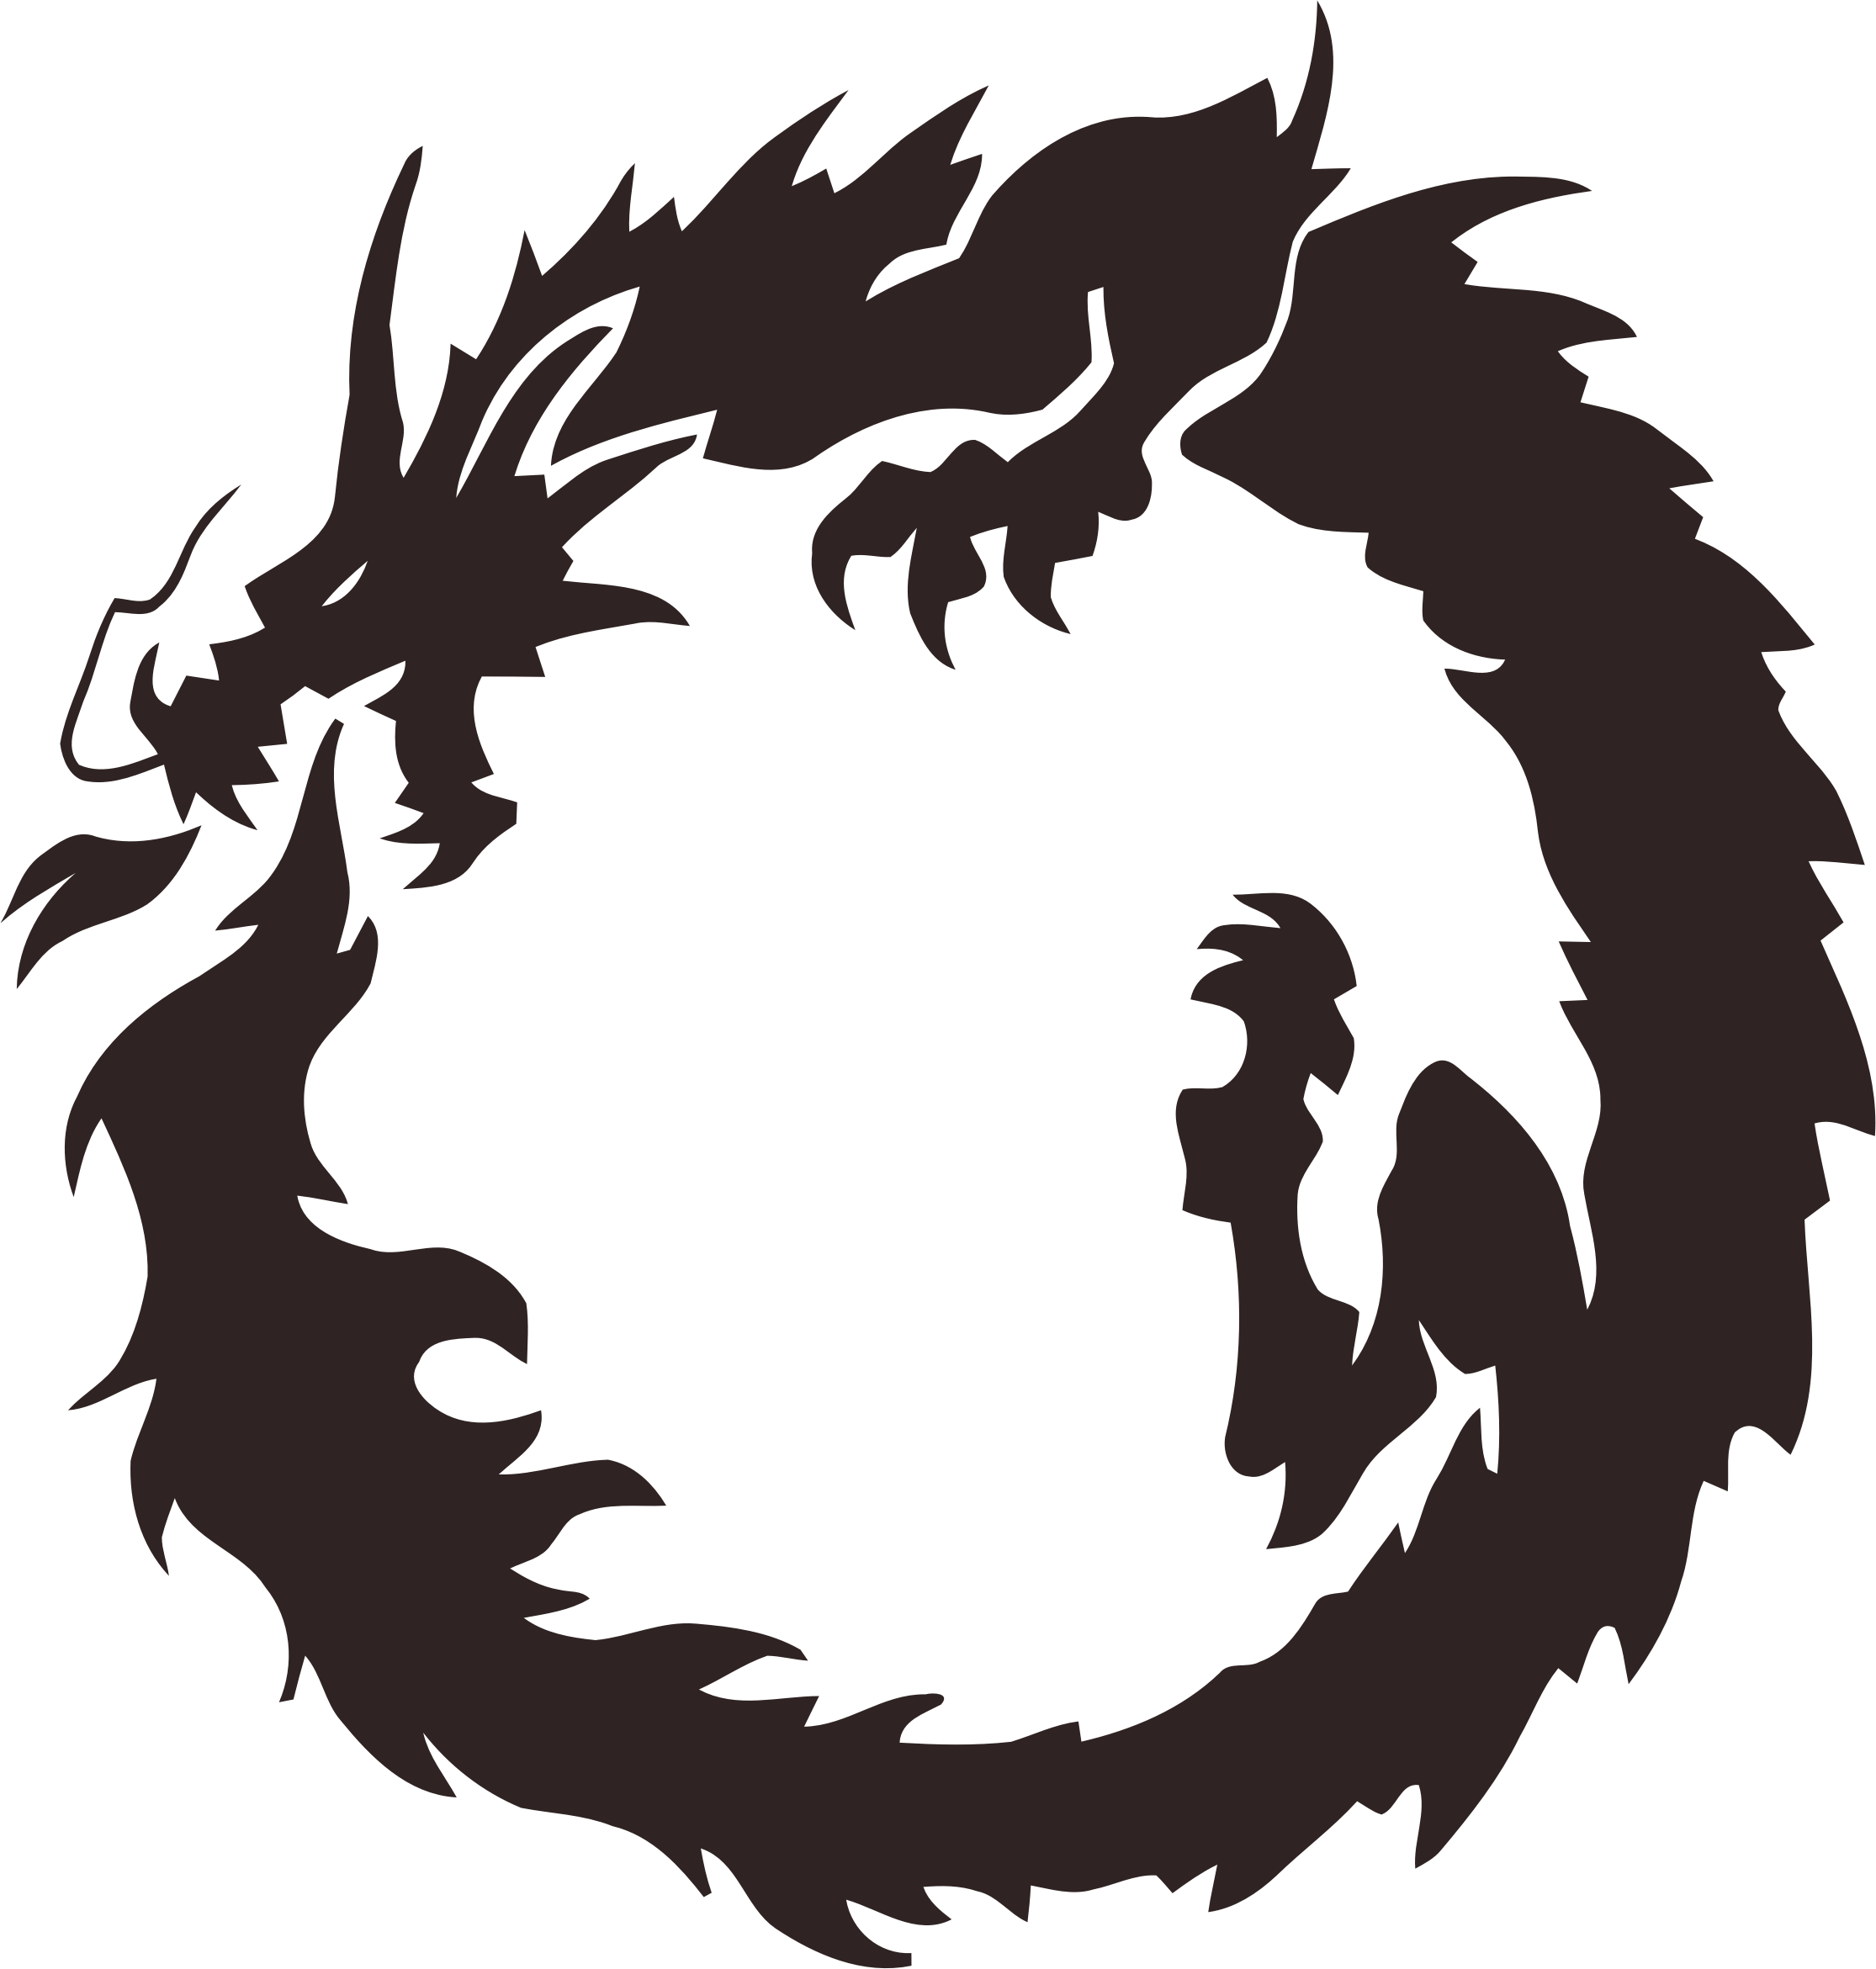 Tribal big image png. Circle clipart dragon